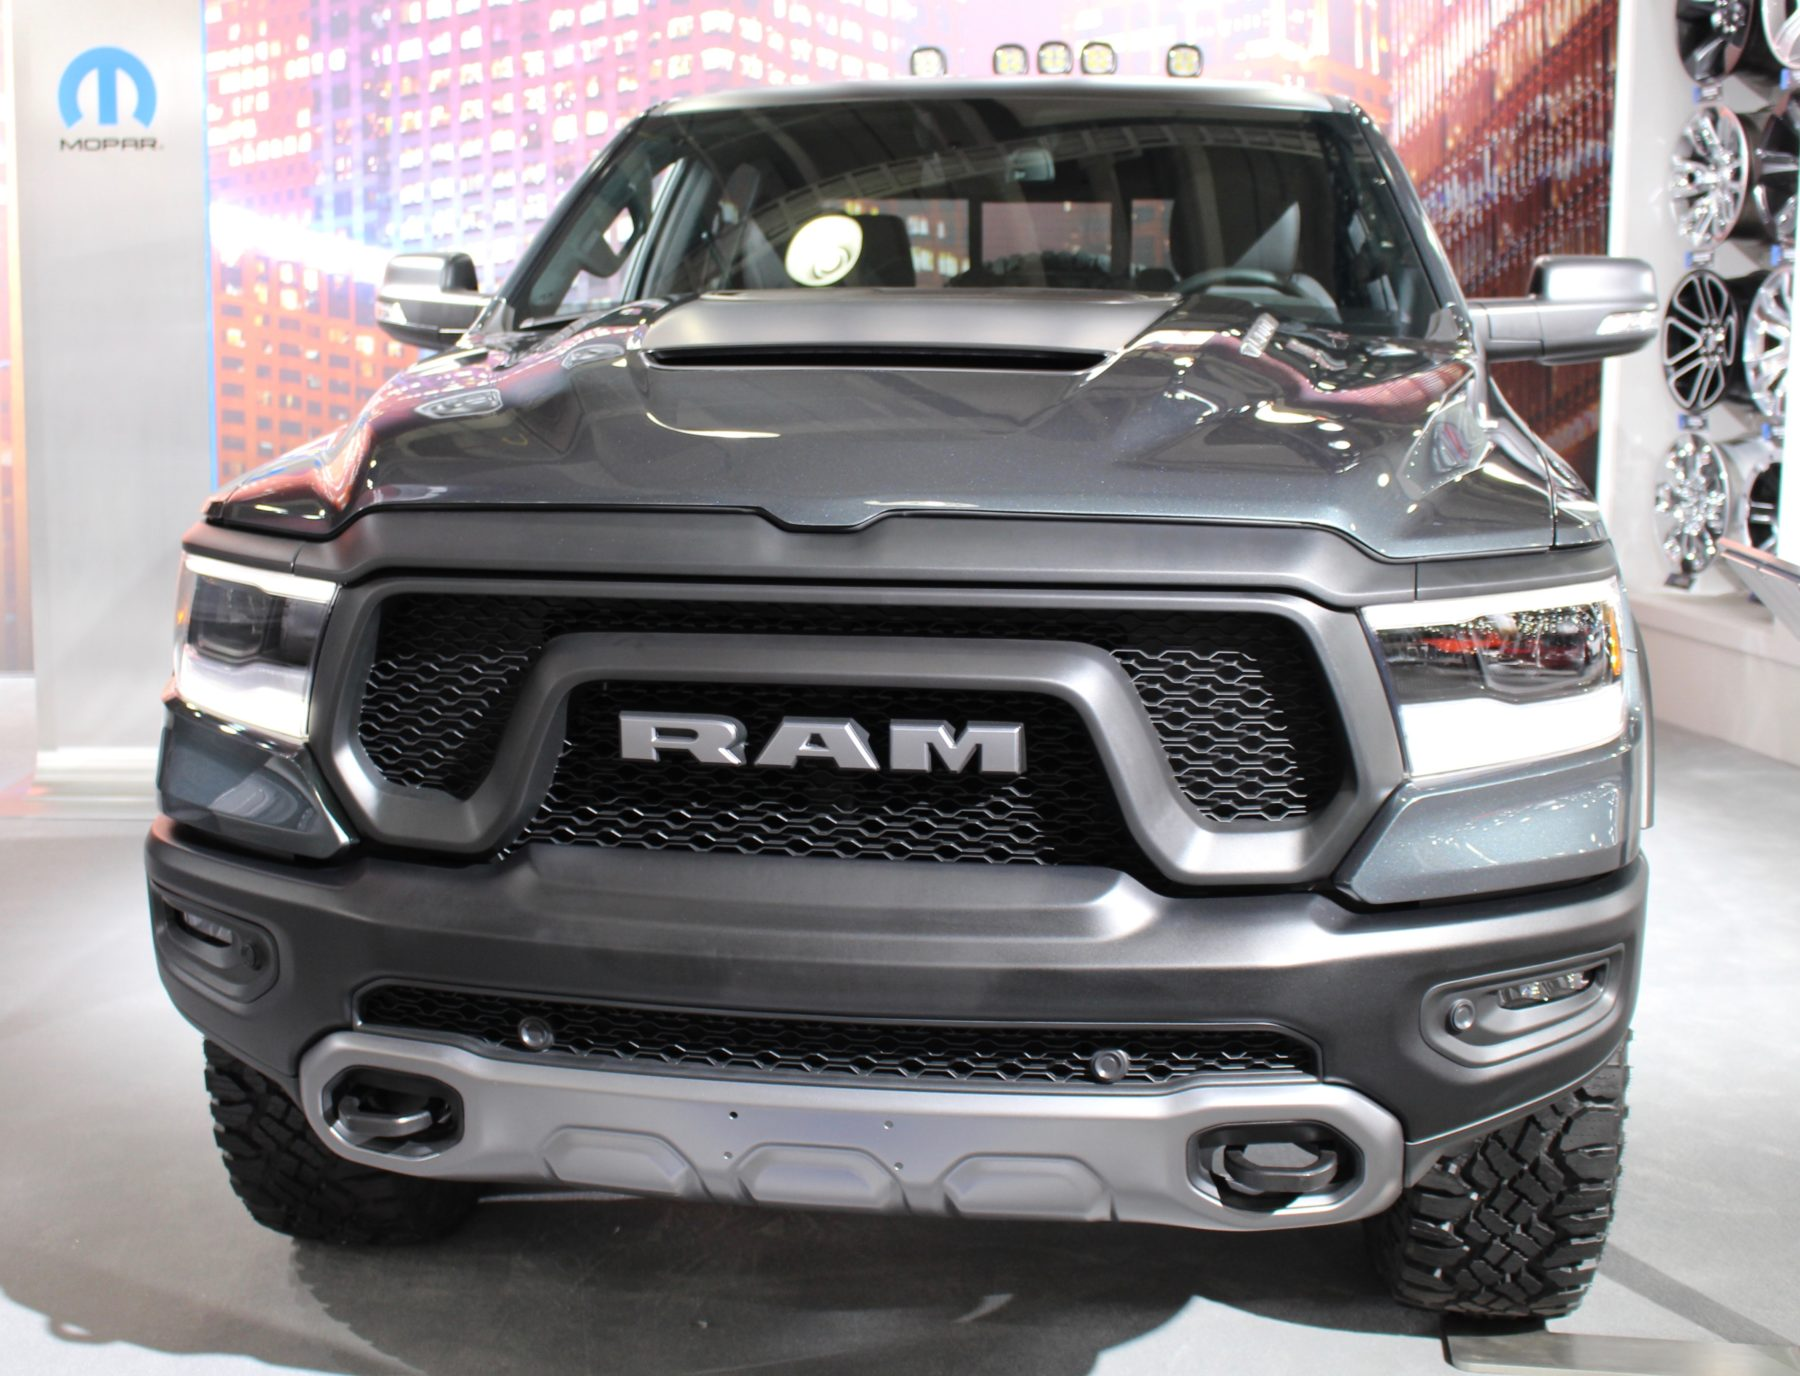 Ram 1500 with Mopar parts